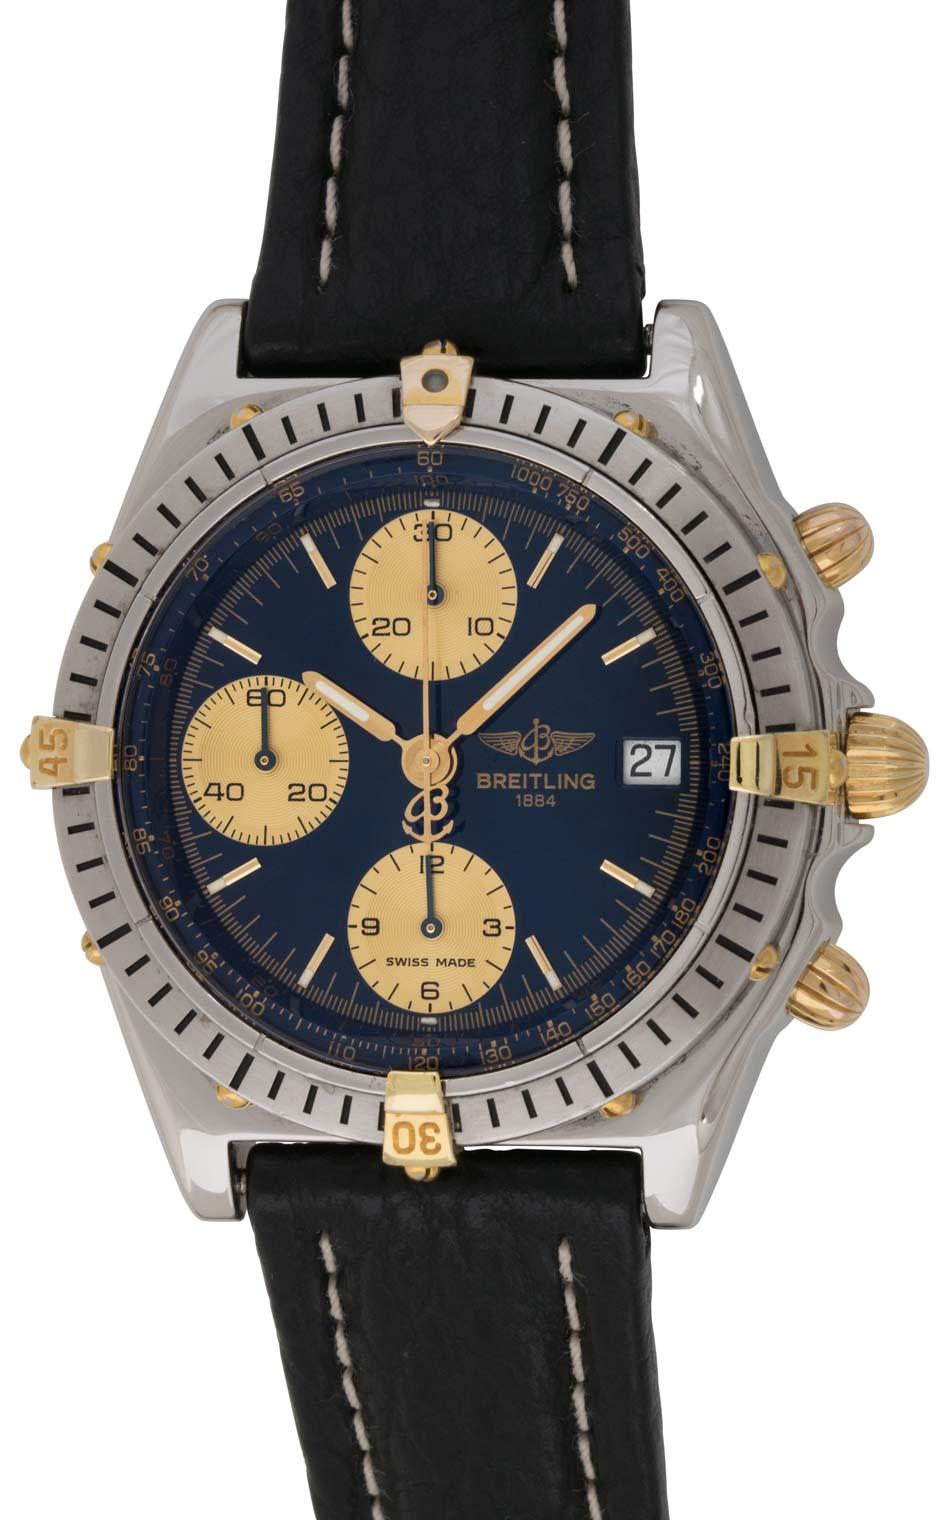 Breitling Chronomat B13048 Watch